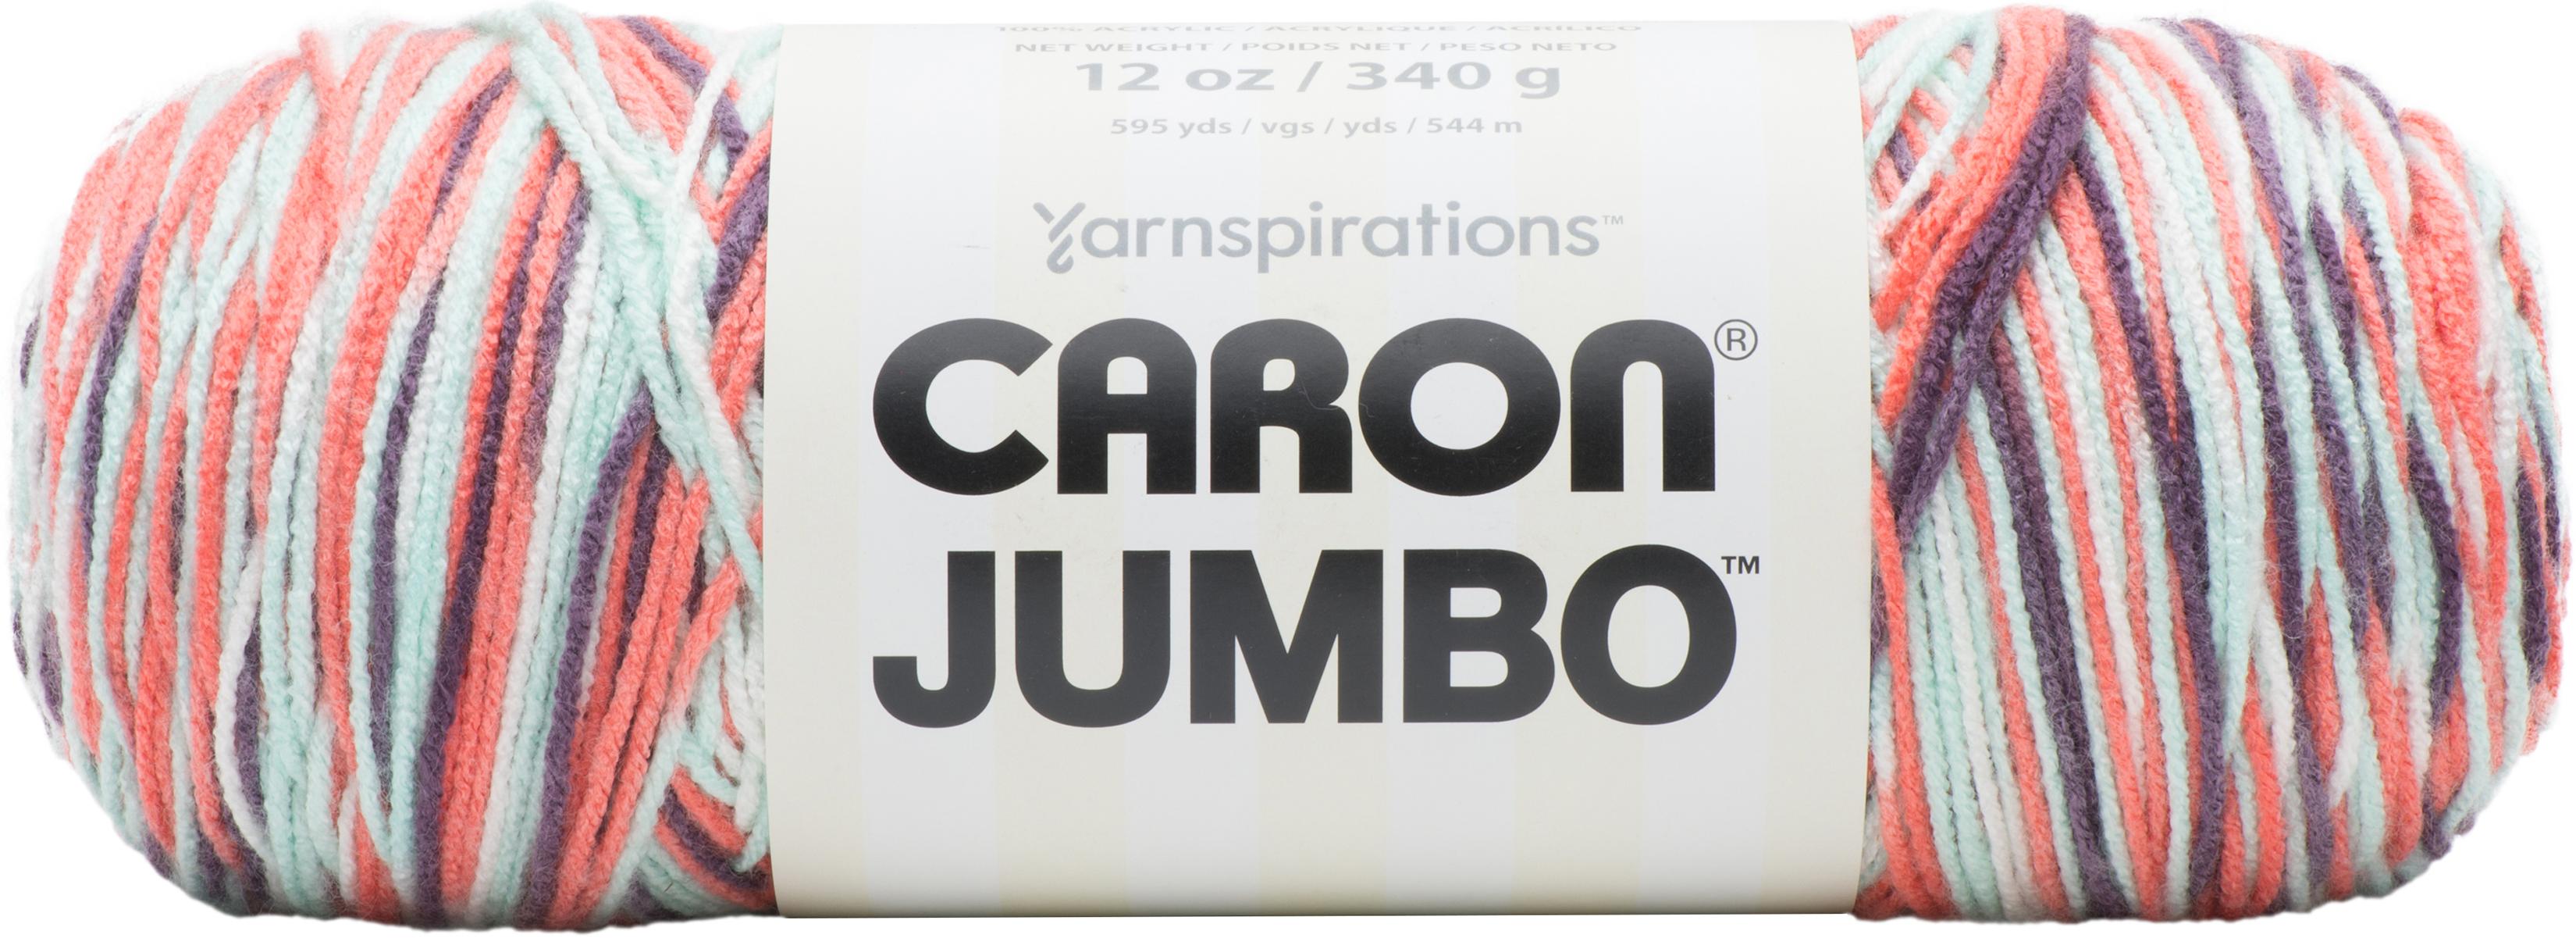 Caron Jumbo Print Century Collection Yarn